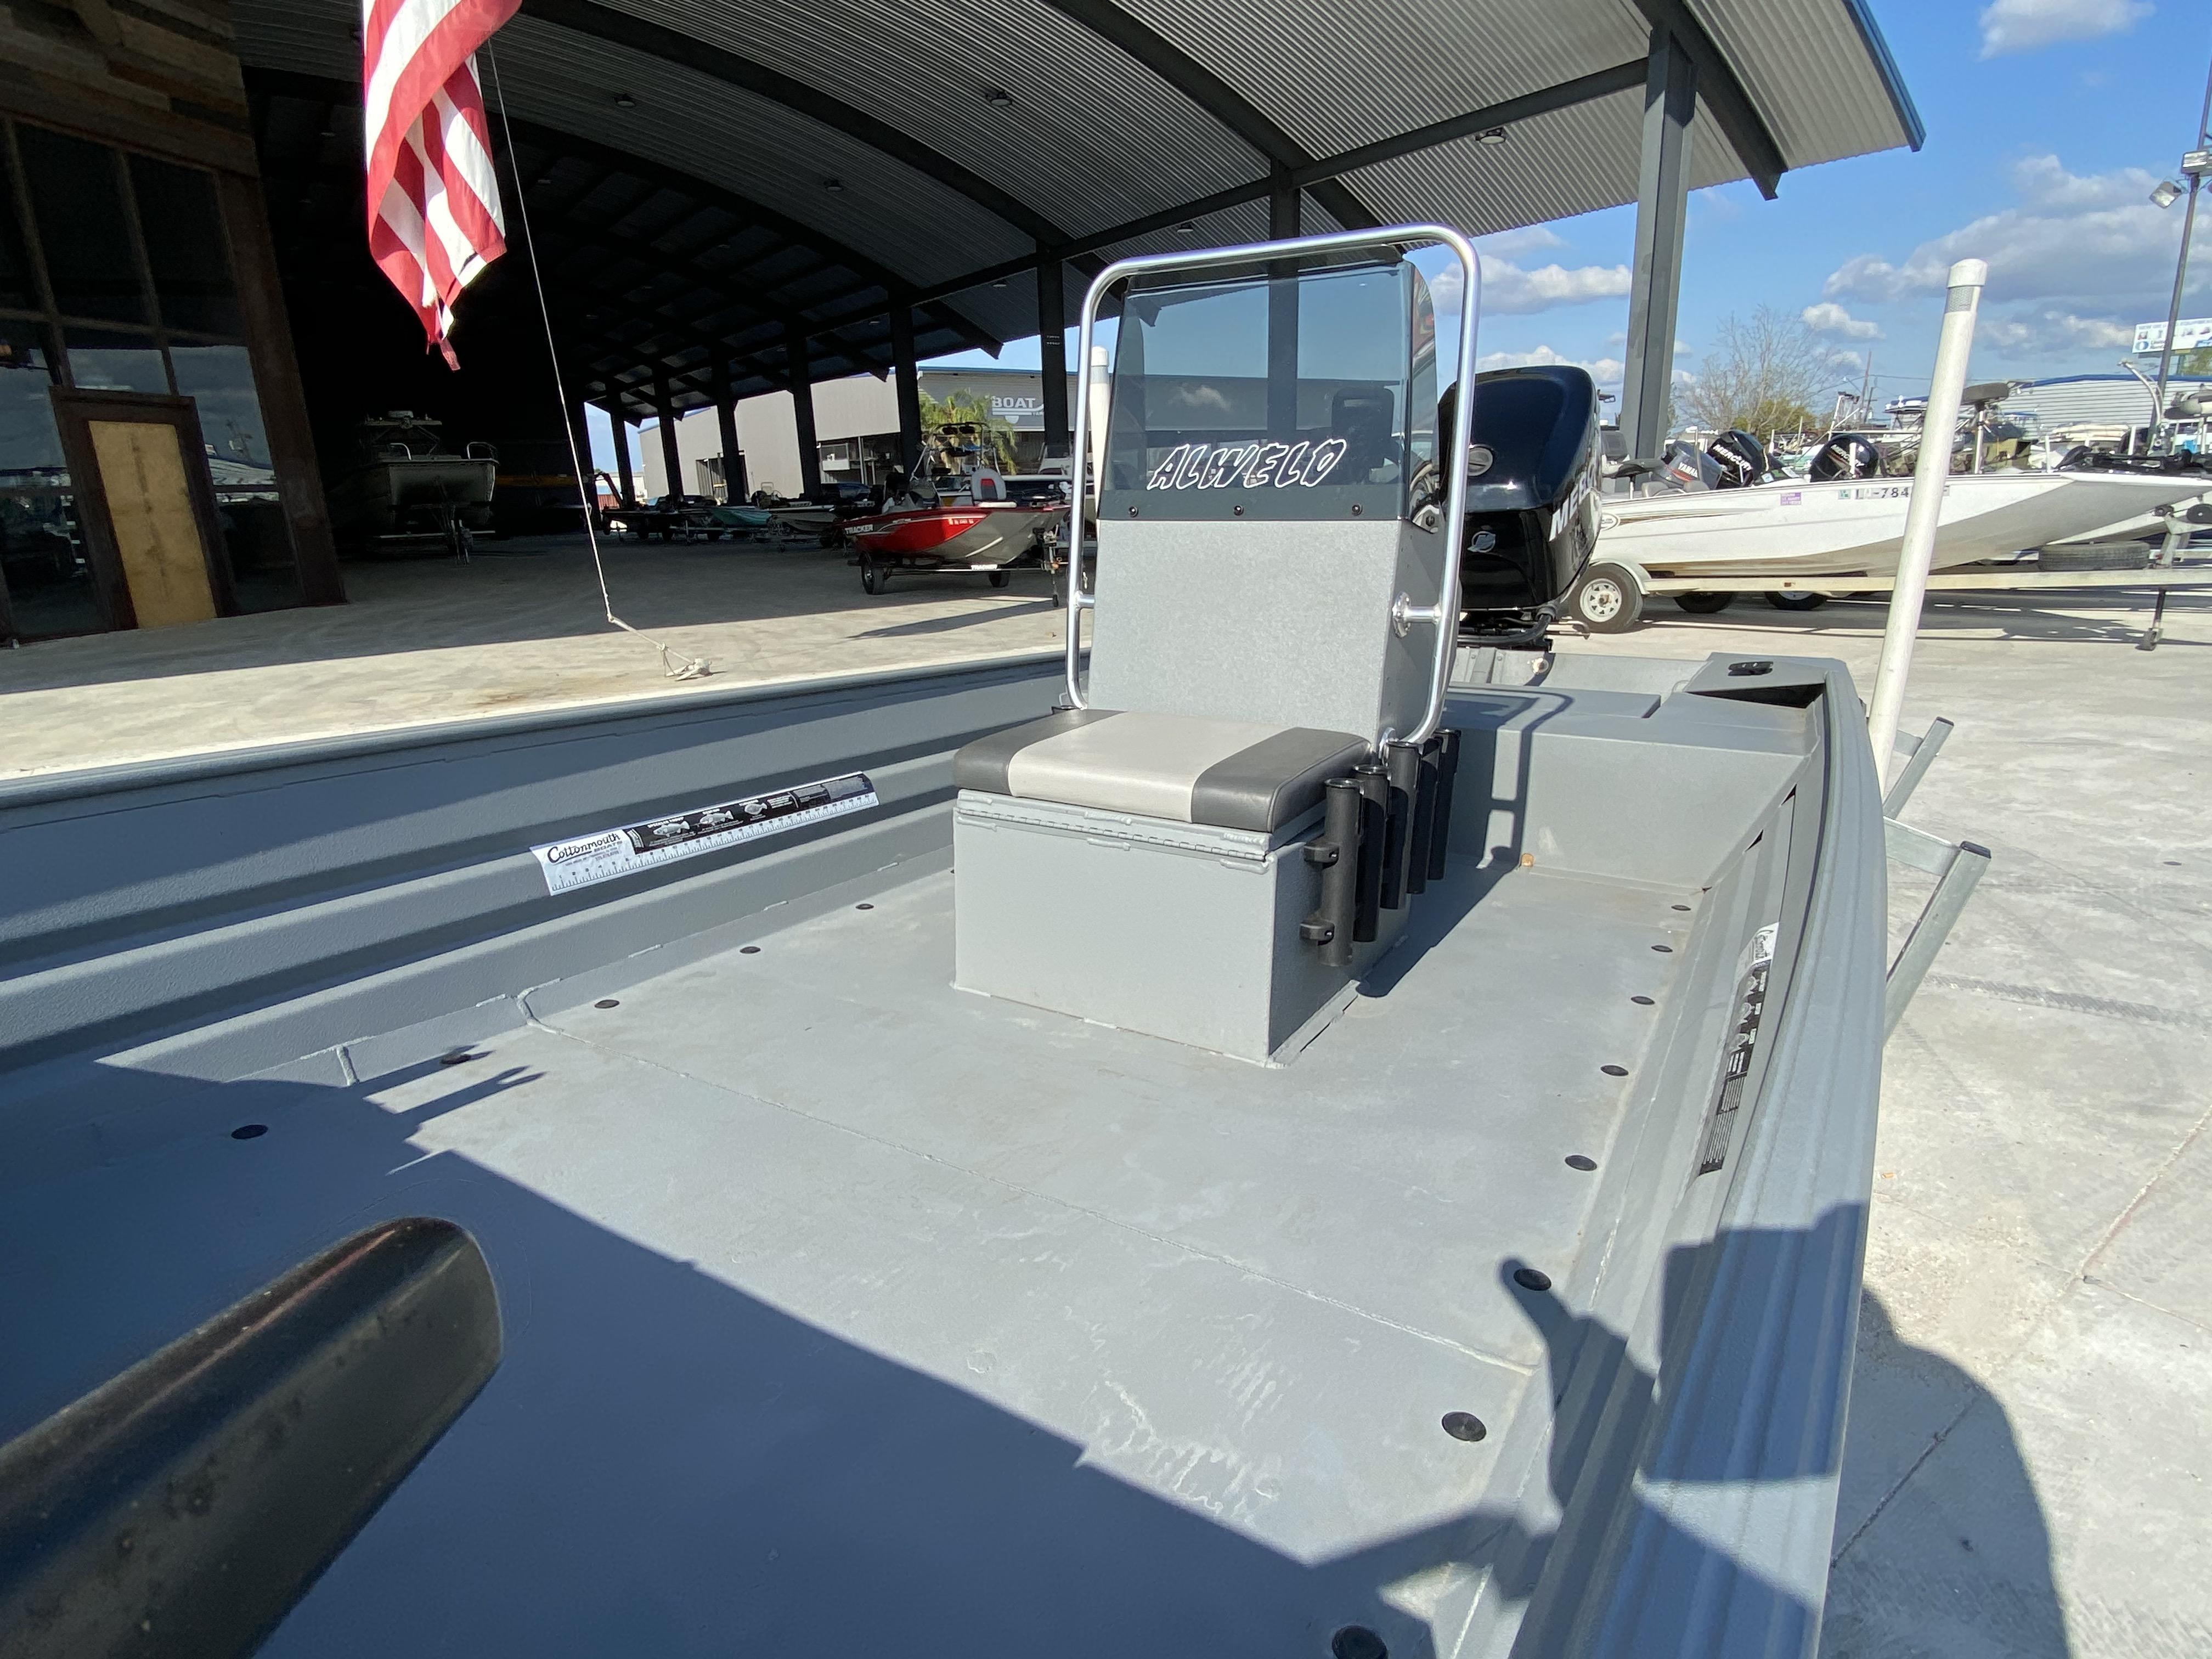 New  2017 Alweld Boats Center Console in Marrero, Louisiana